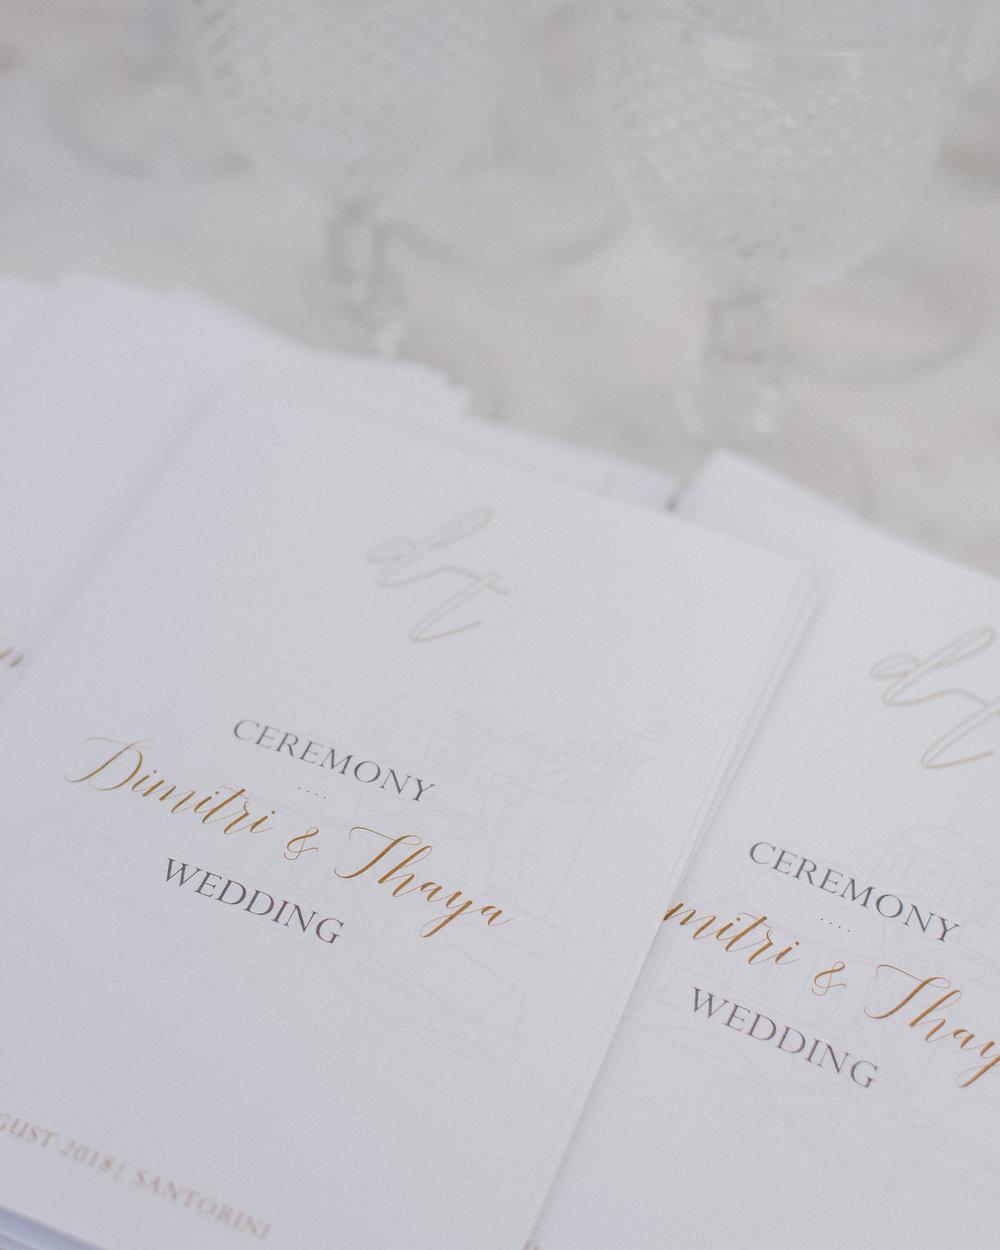 santorini-island-greece-wedding-celebration-ceremony-booklet-bridal-groom-bride-dinner-sunset-rocabella-hotel-silkentile-event-planning-firm